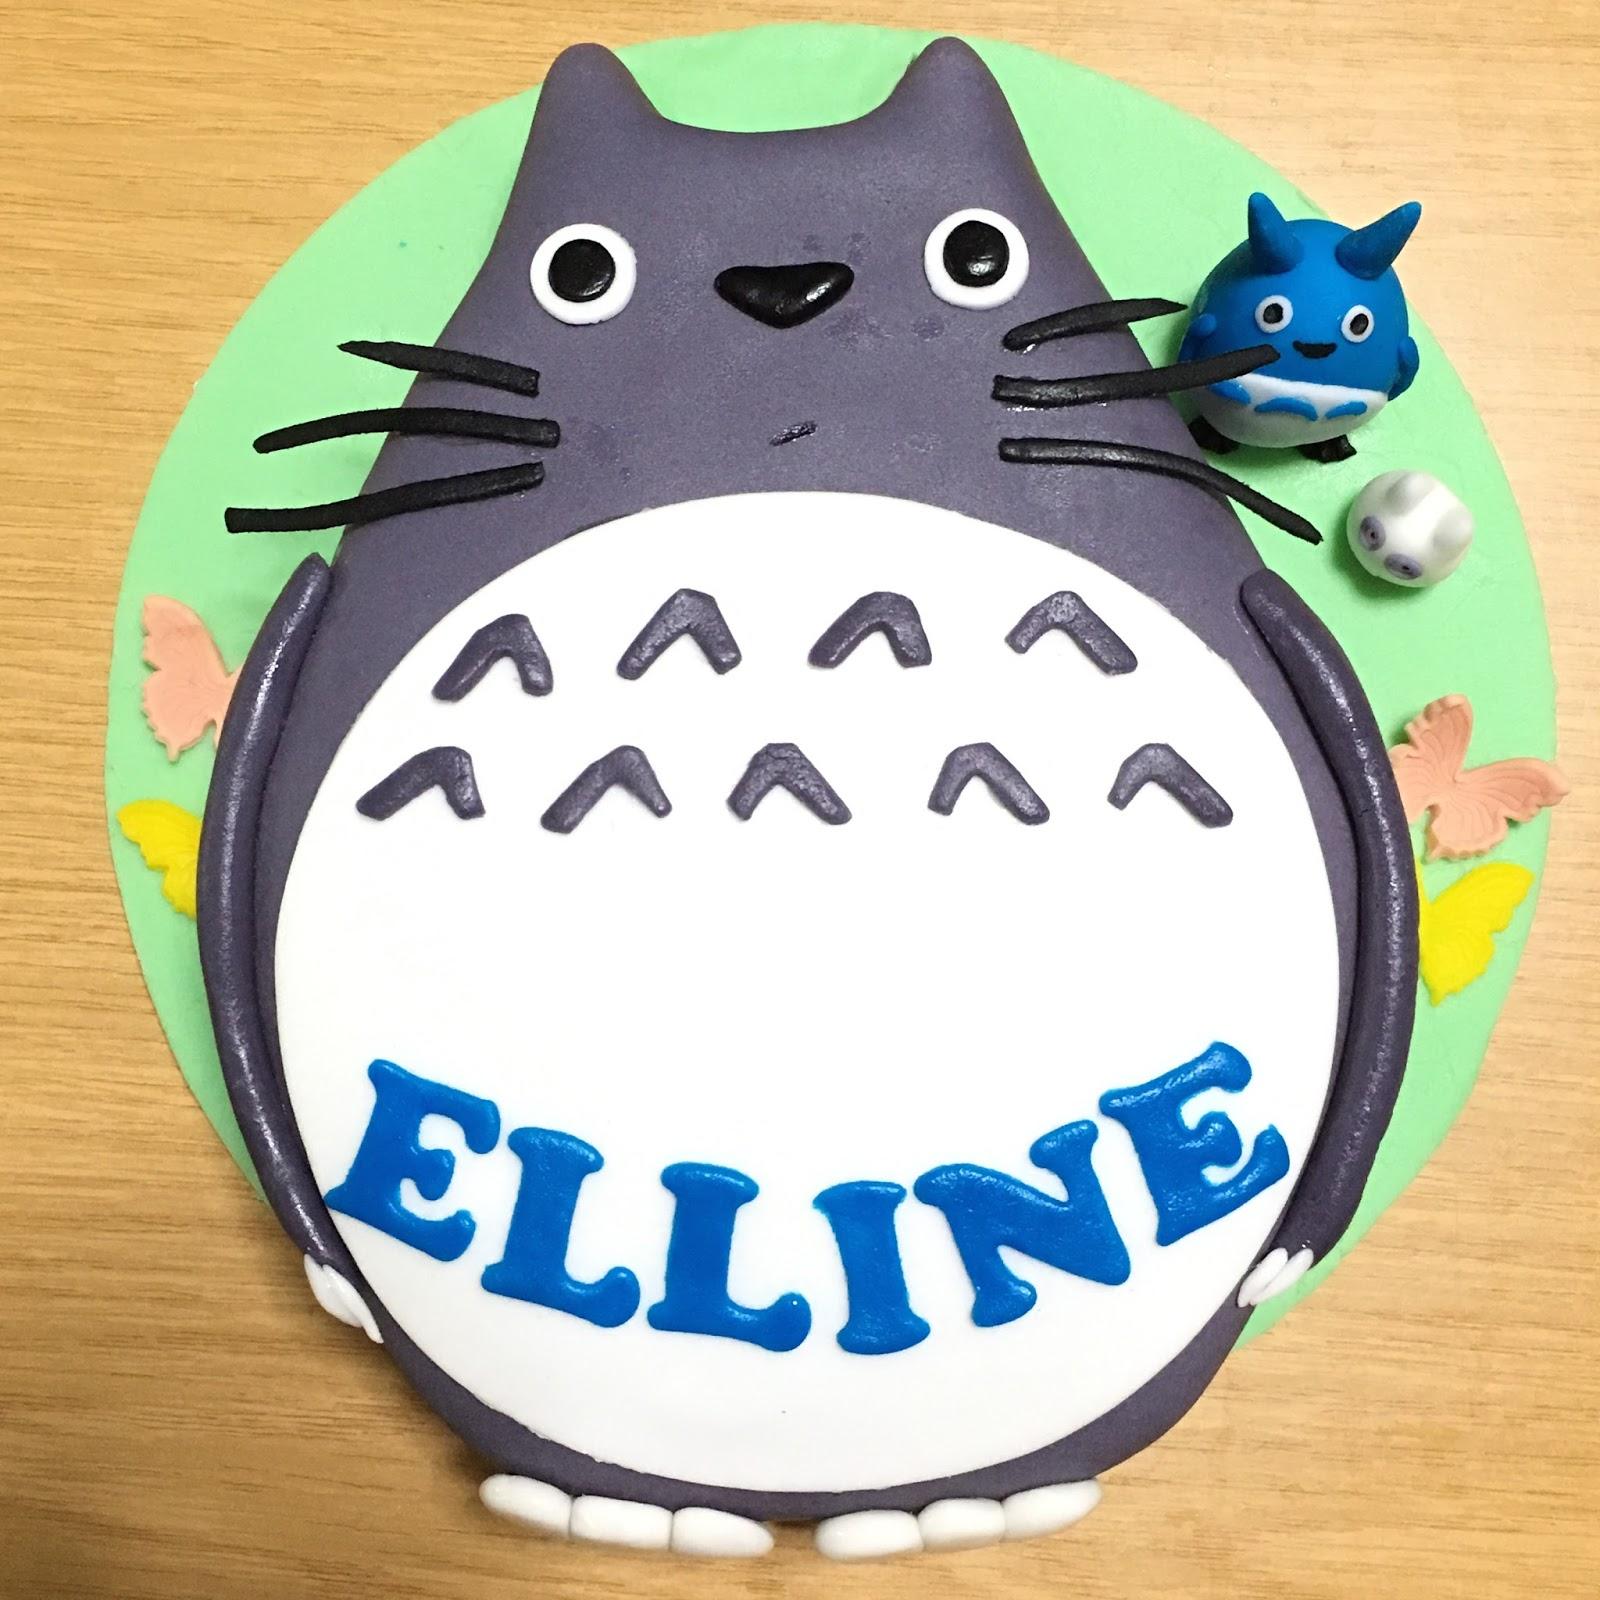 Swell Totoro Cake Sherbakes Funny Birthday Cards Online Aeocydamsfinfo